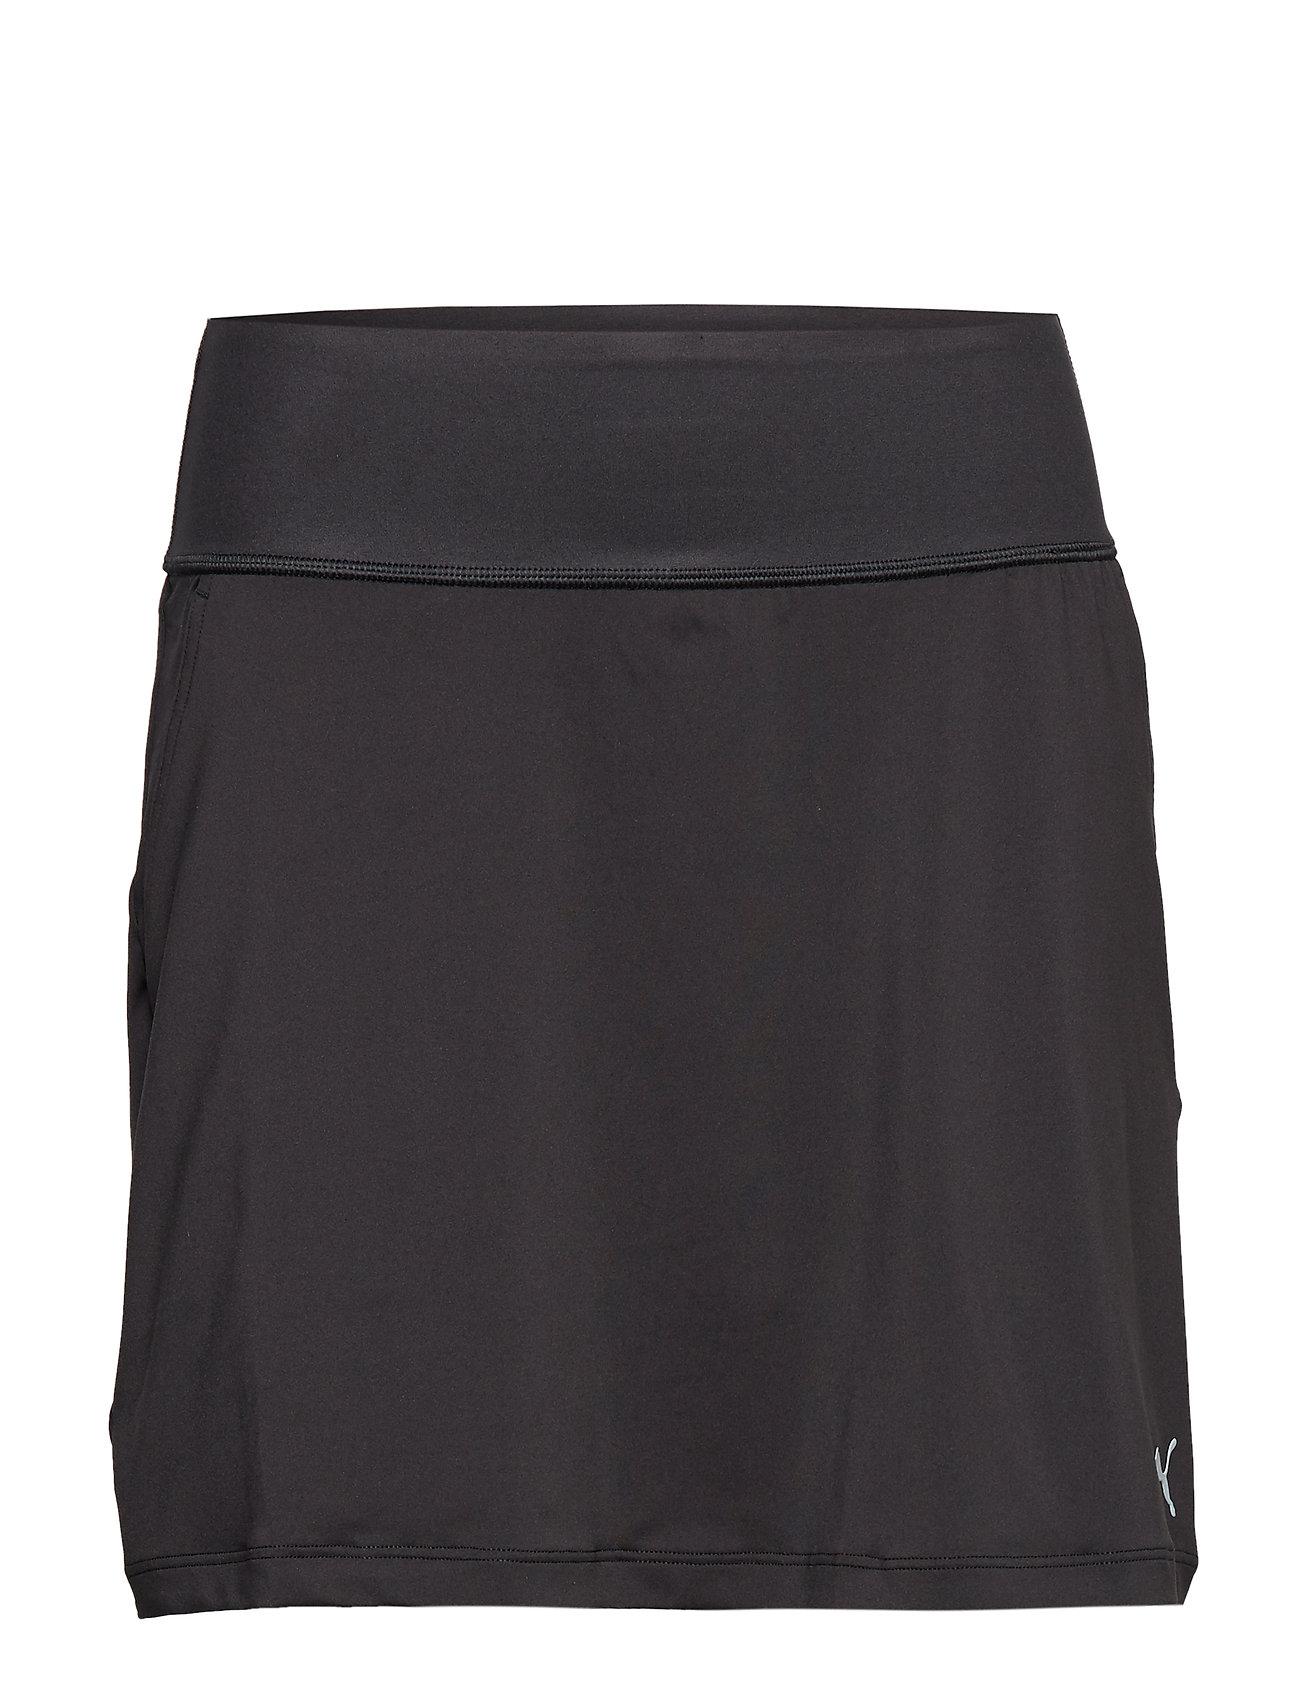 PUMA Golf PWRSHAPE Solid Knit Skirt - PUMA BLACK